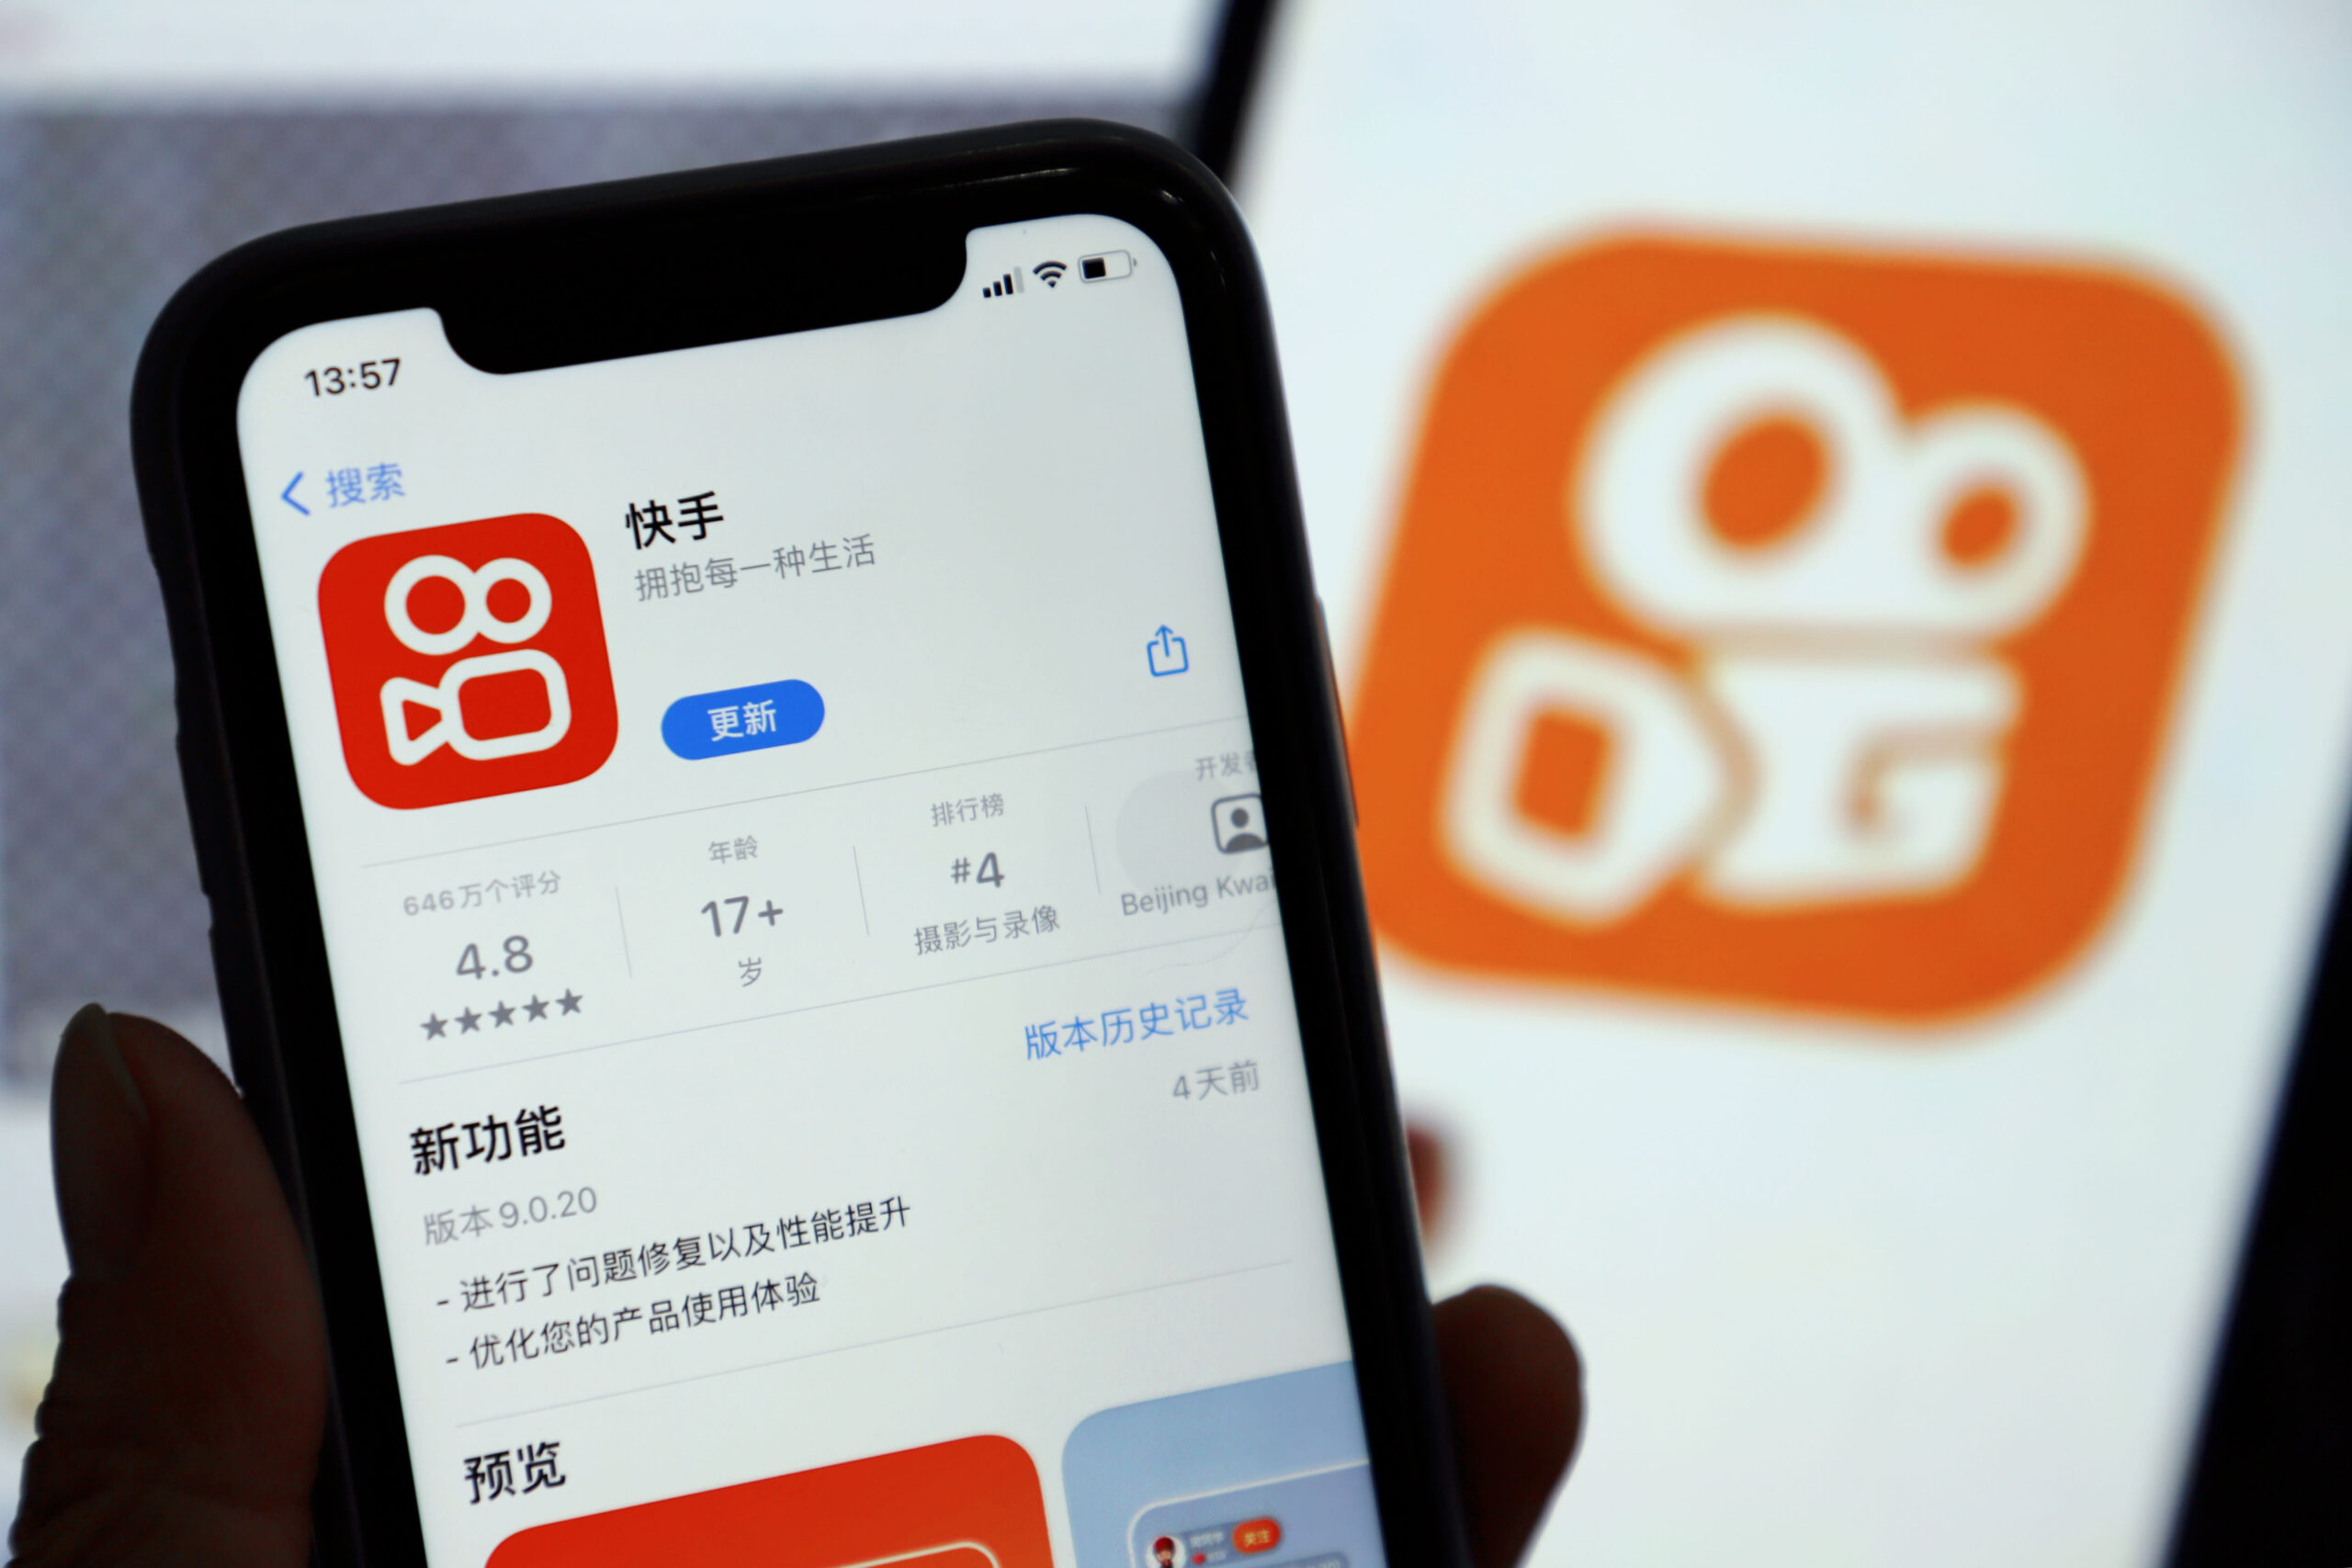 Kuaishou's $5 billion IPO: Everything you need to know about the TikTok rival